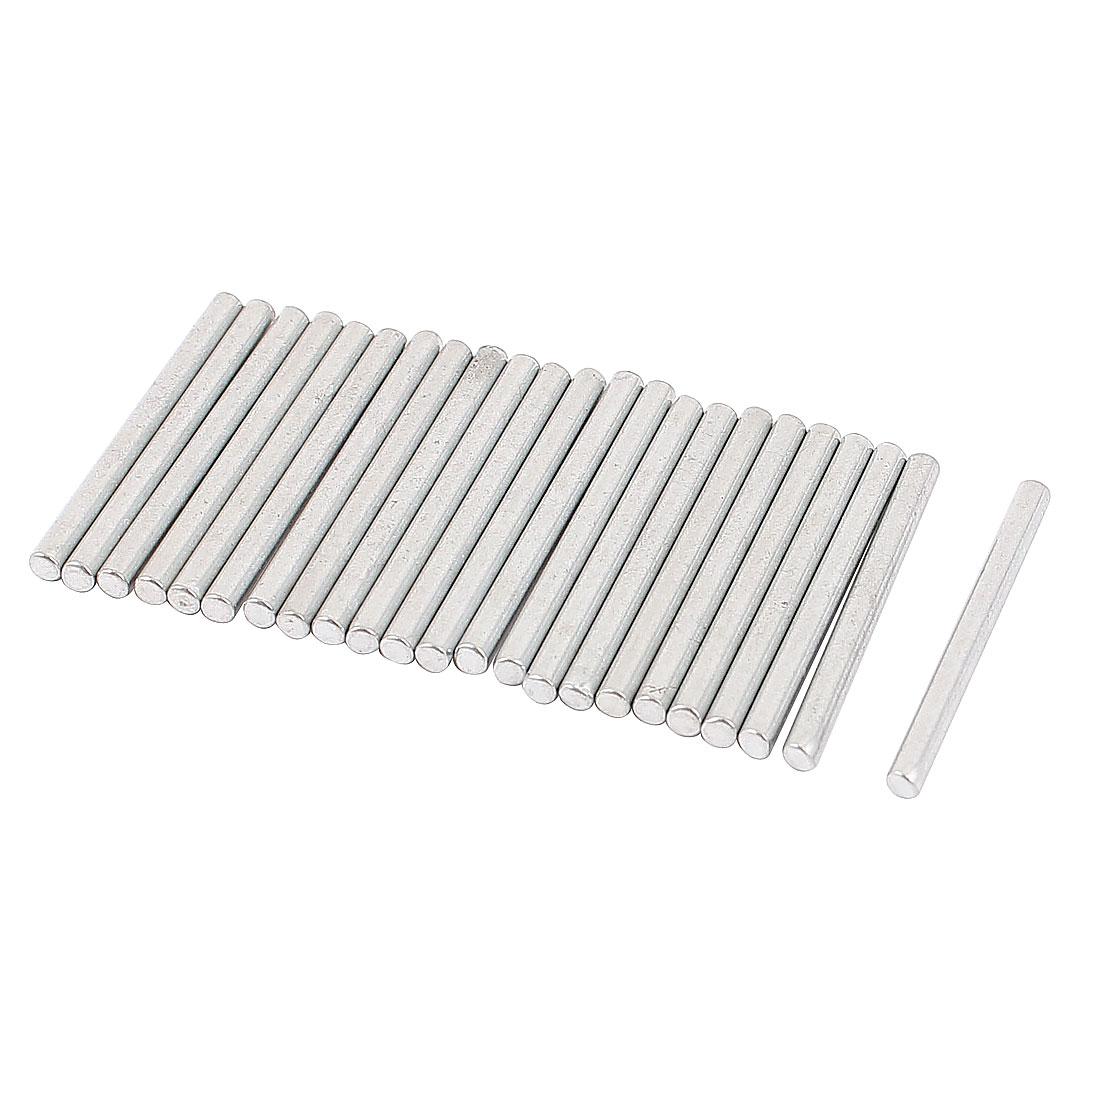 20 Pcs 2mm Dia 25mm Length Metal Solid Round Rod Bar for DIY RC Car